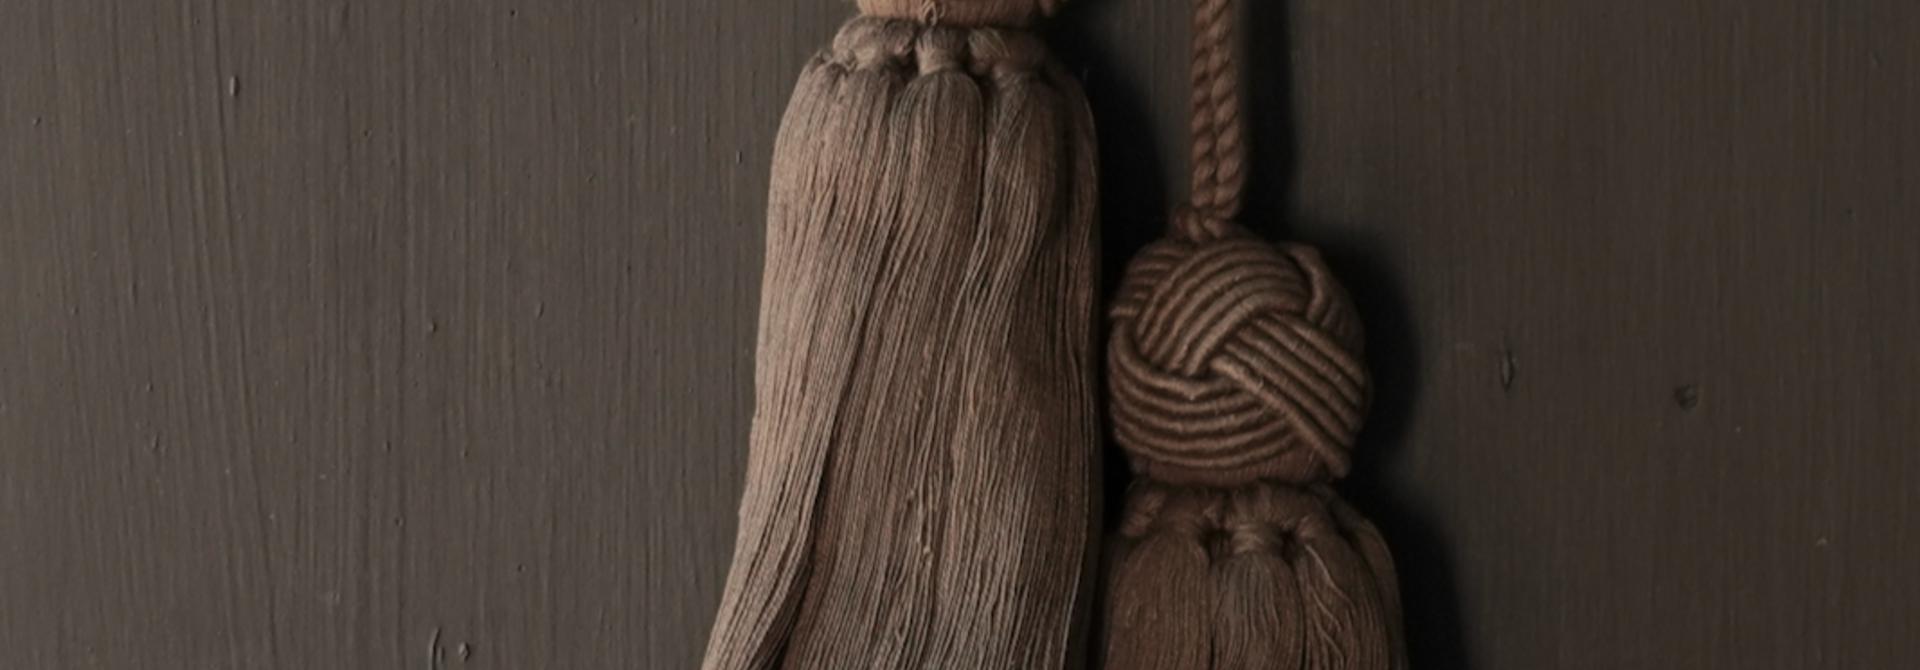 Cotton tassel, brush or tuft